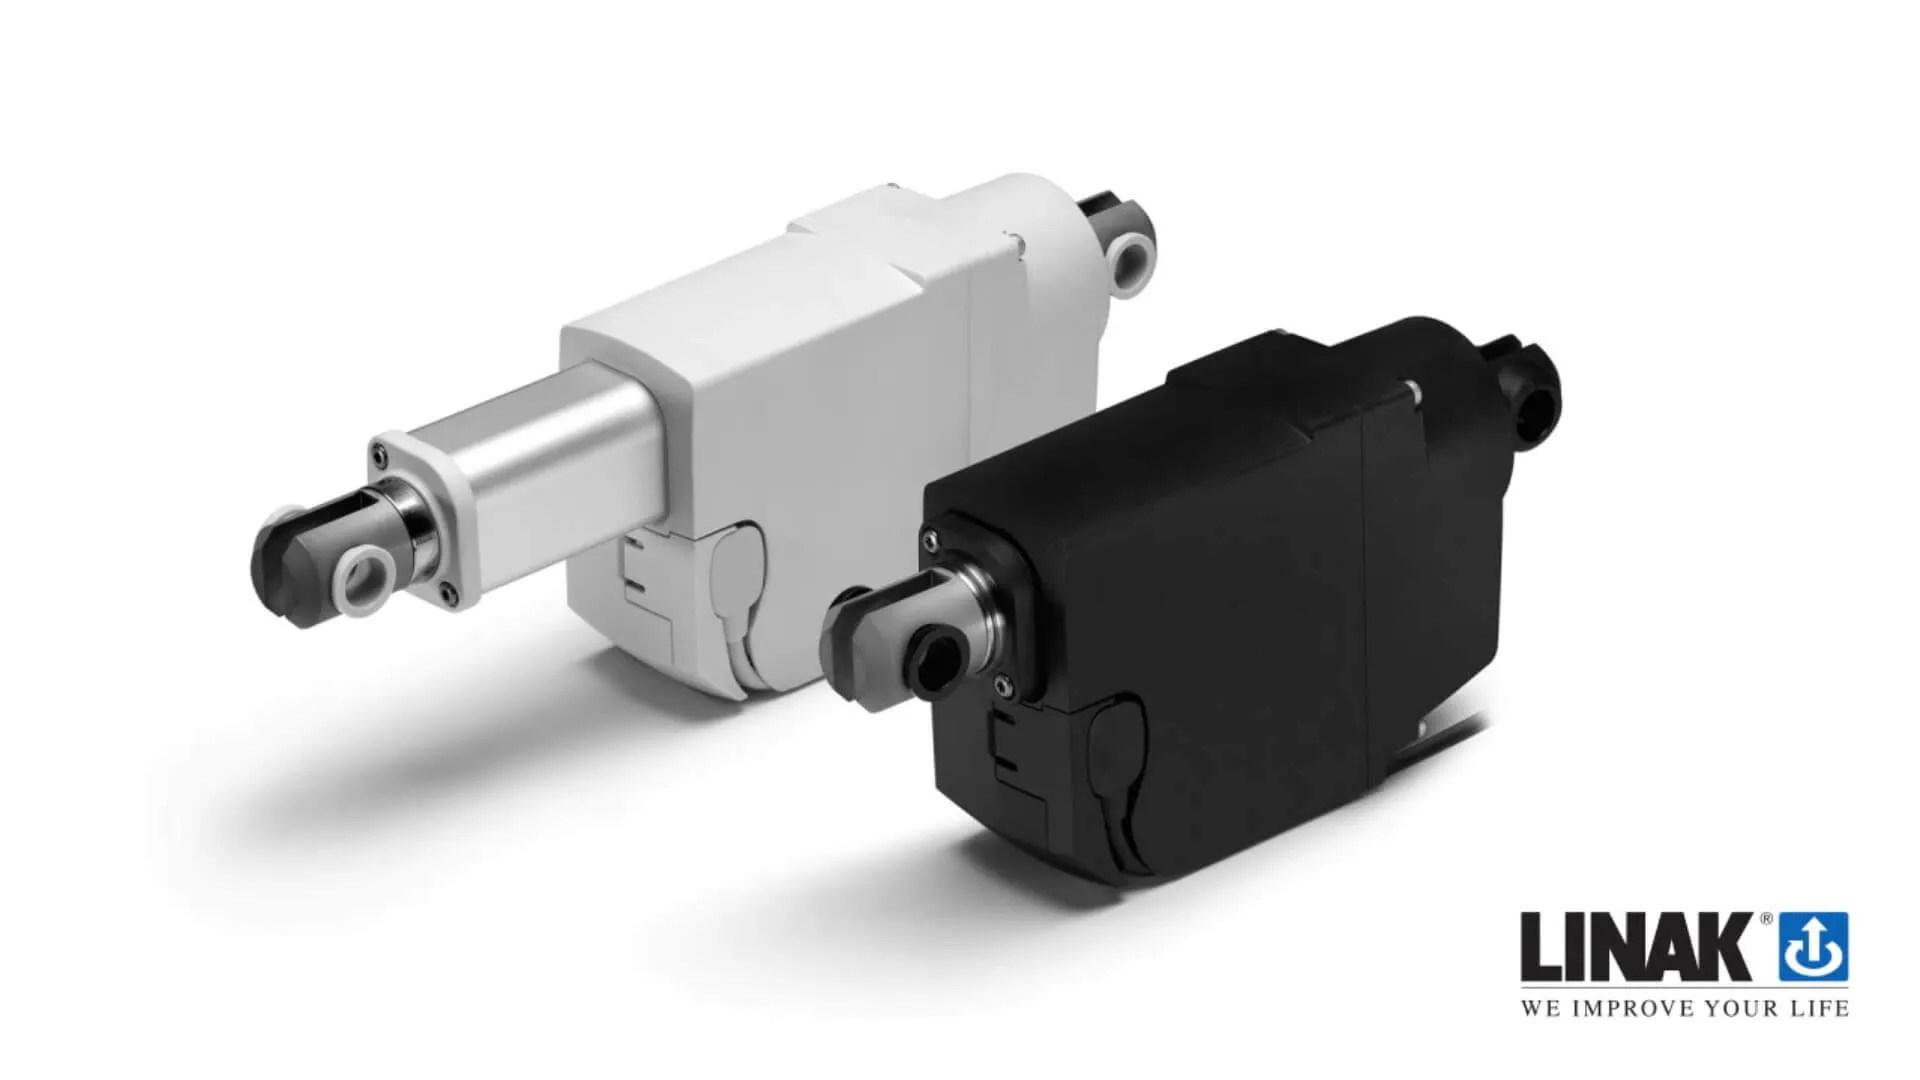 hight resolution of linak linear actuator wiring diagram circuit diagram symbols u2022 12 volt trolling motor wiring 12